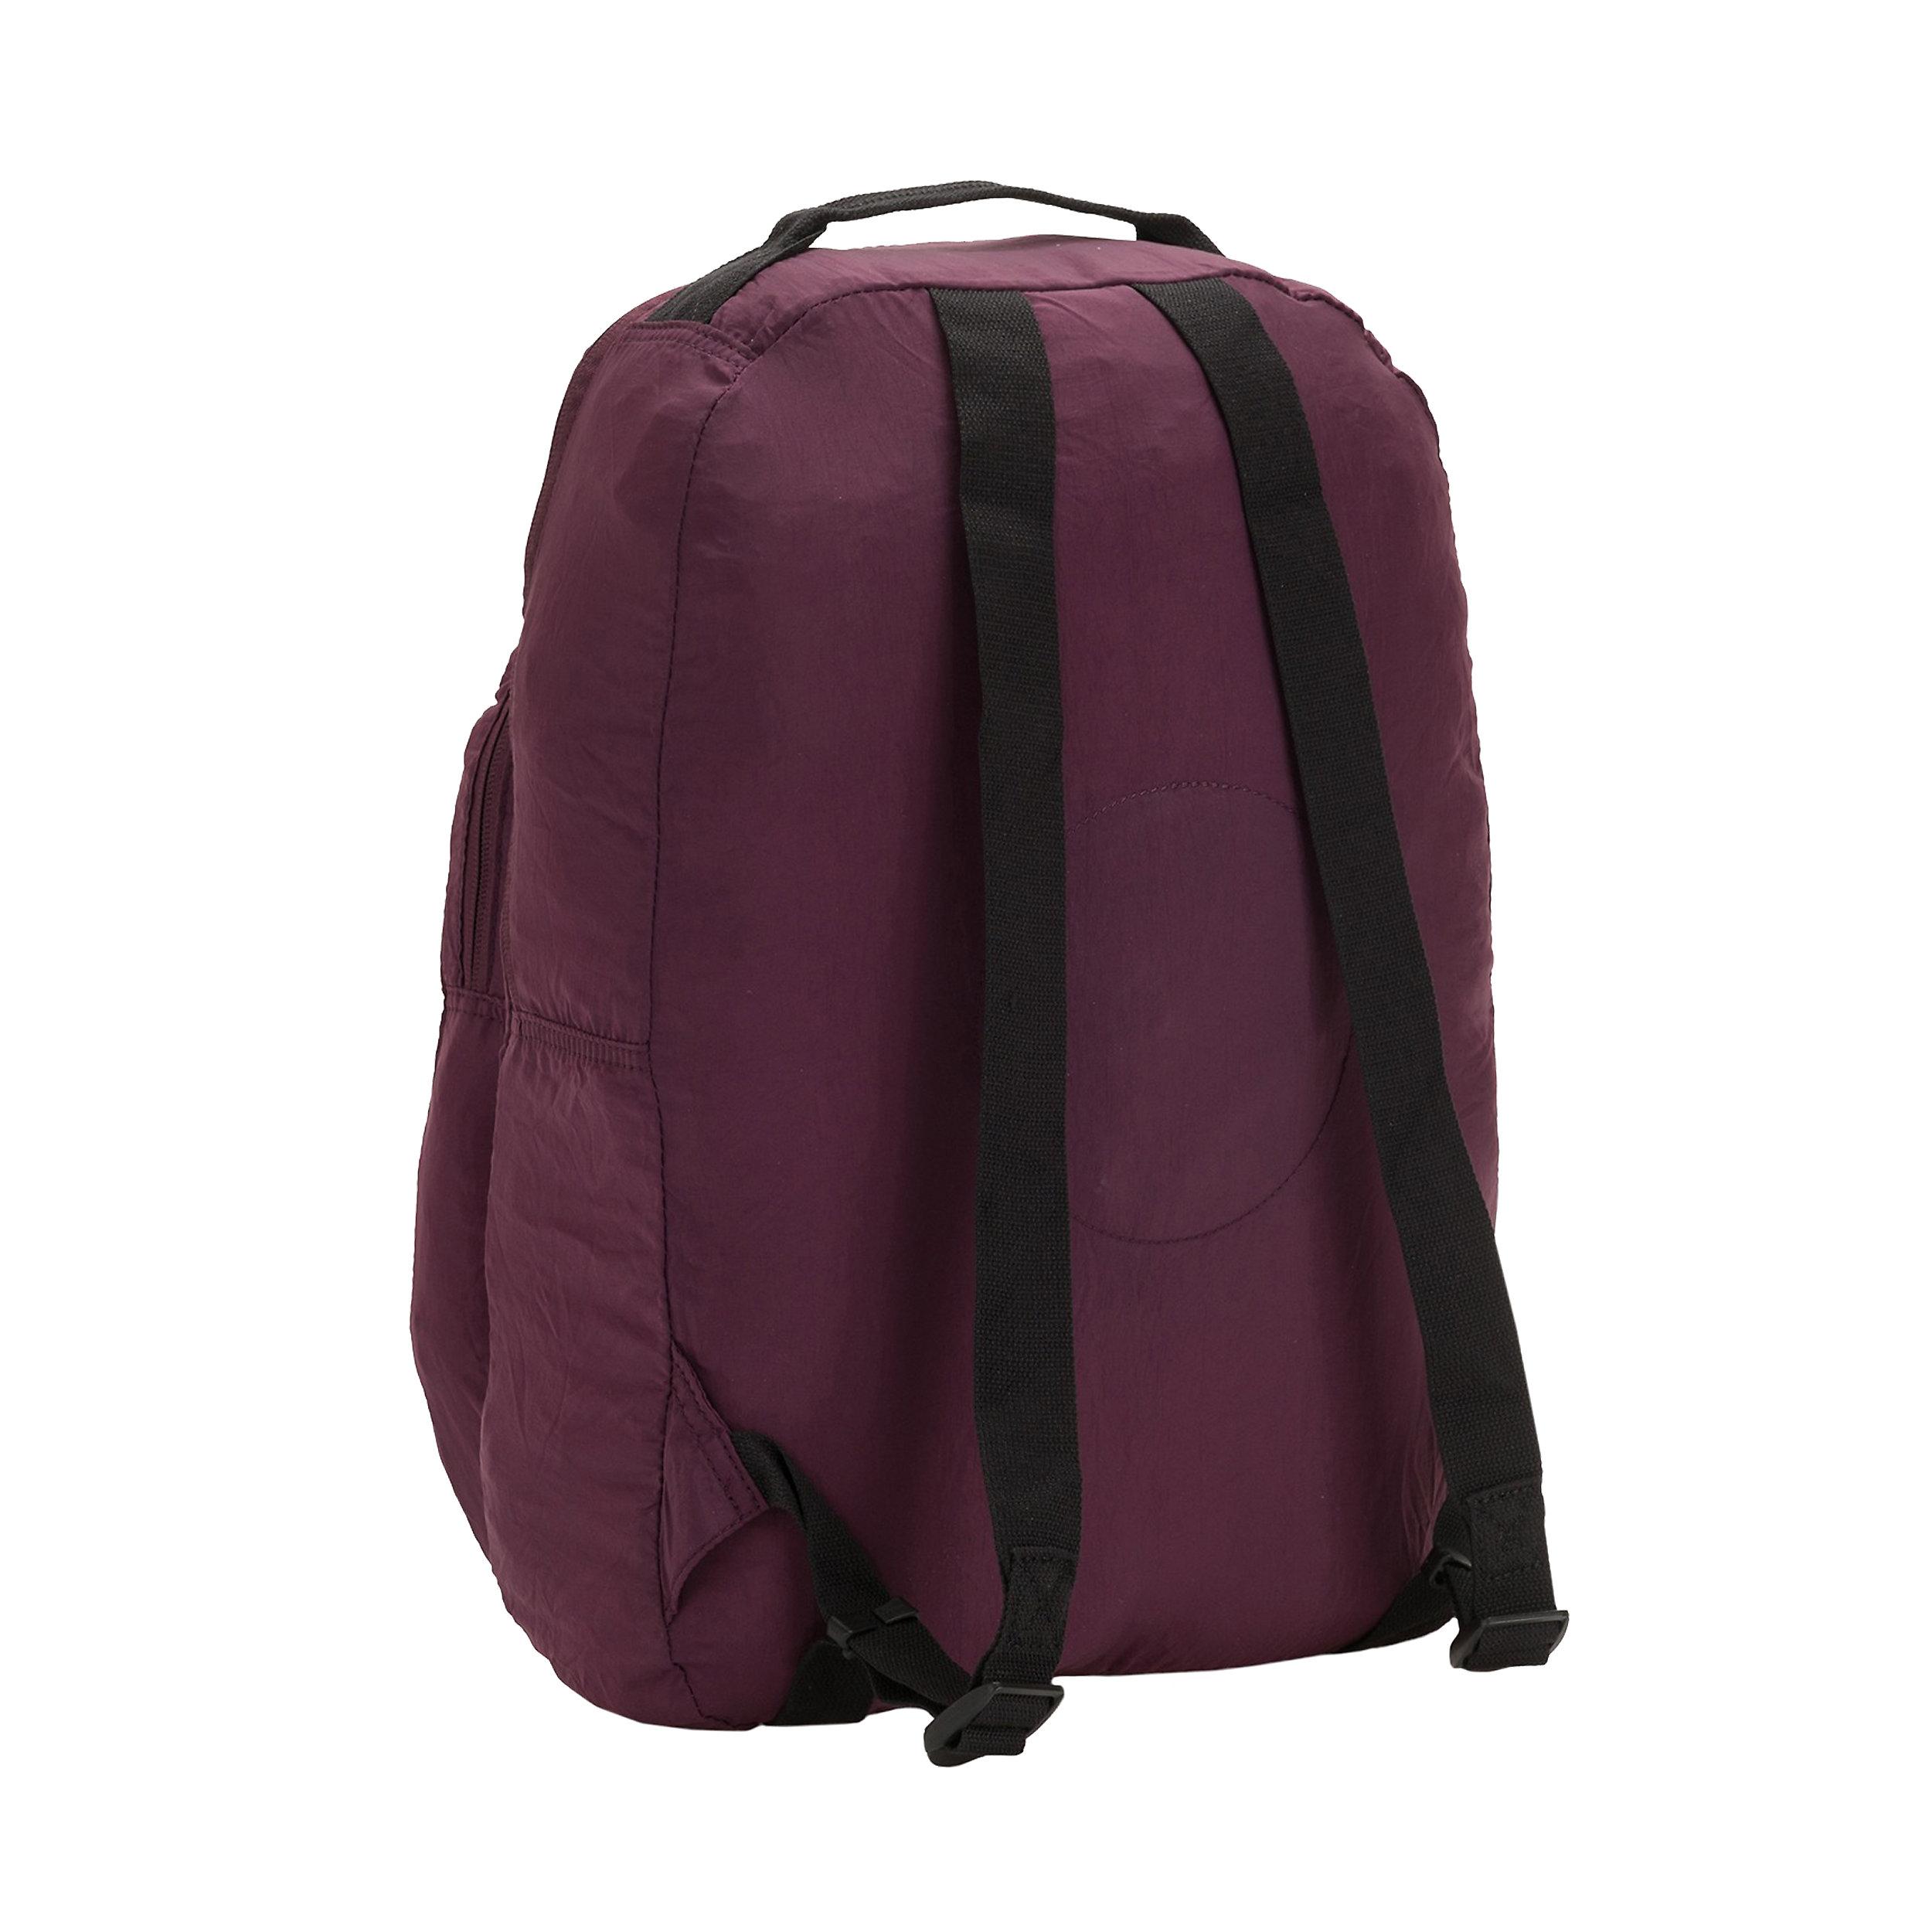 Backpack Seoul Packable Bags 22.5 Liter